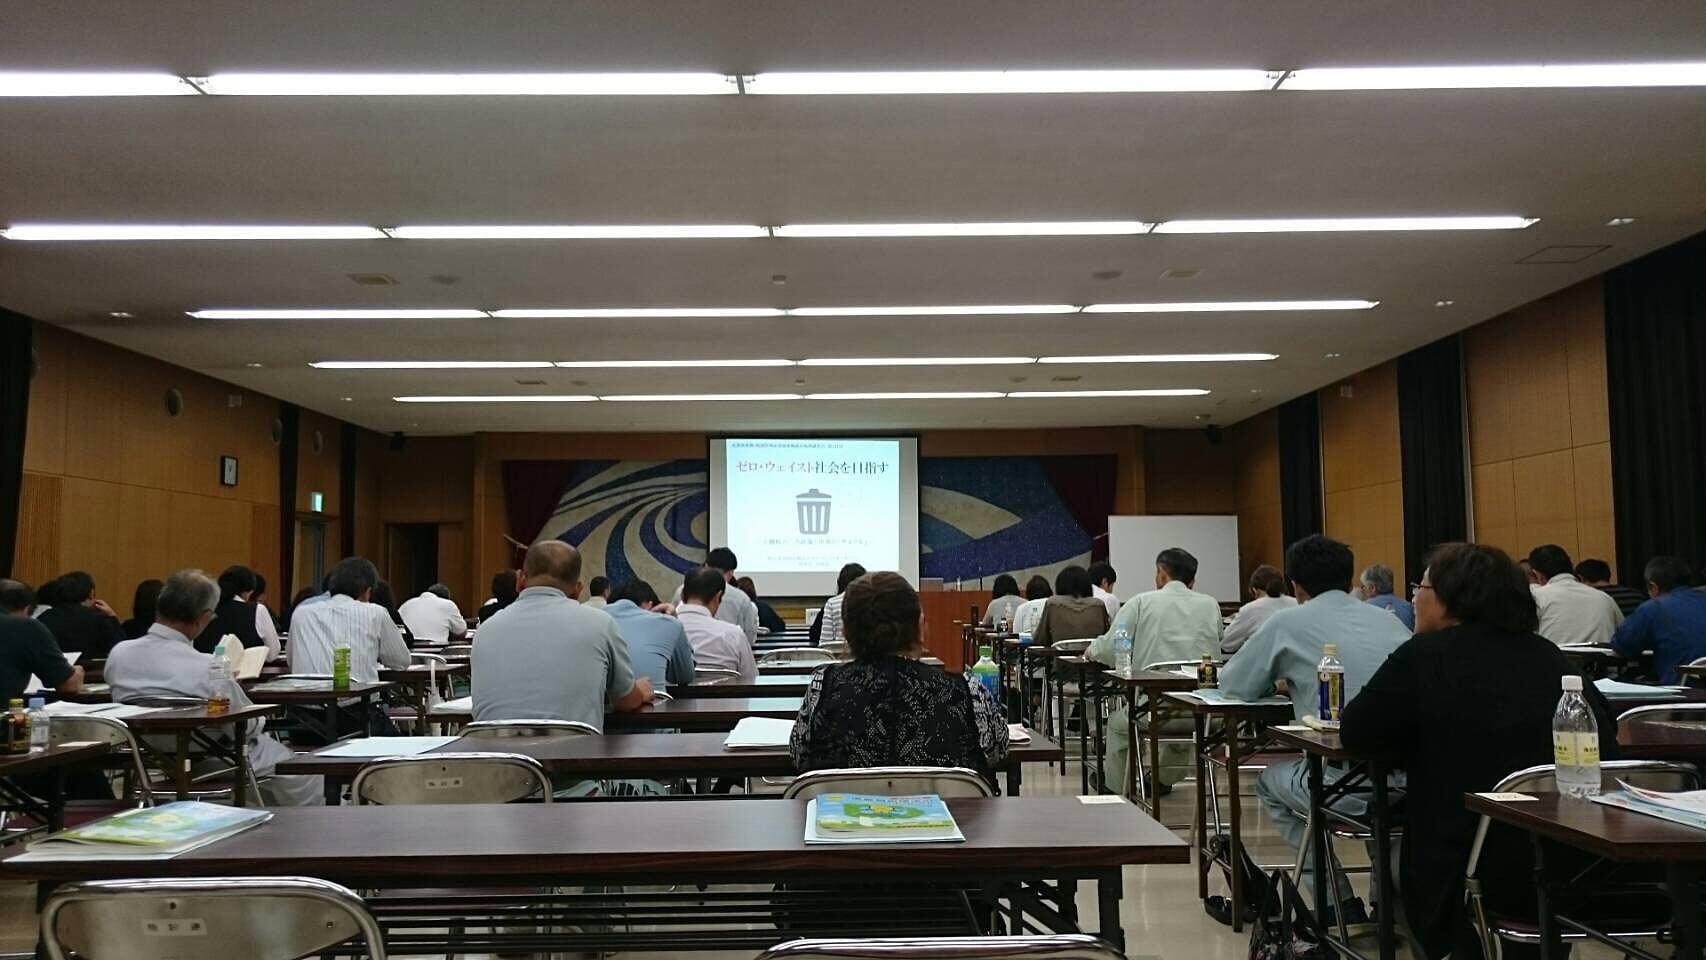 http://wakou-cs.co.jp/files/libs/173/201709291557335117.jpg